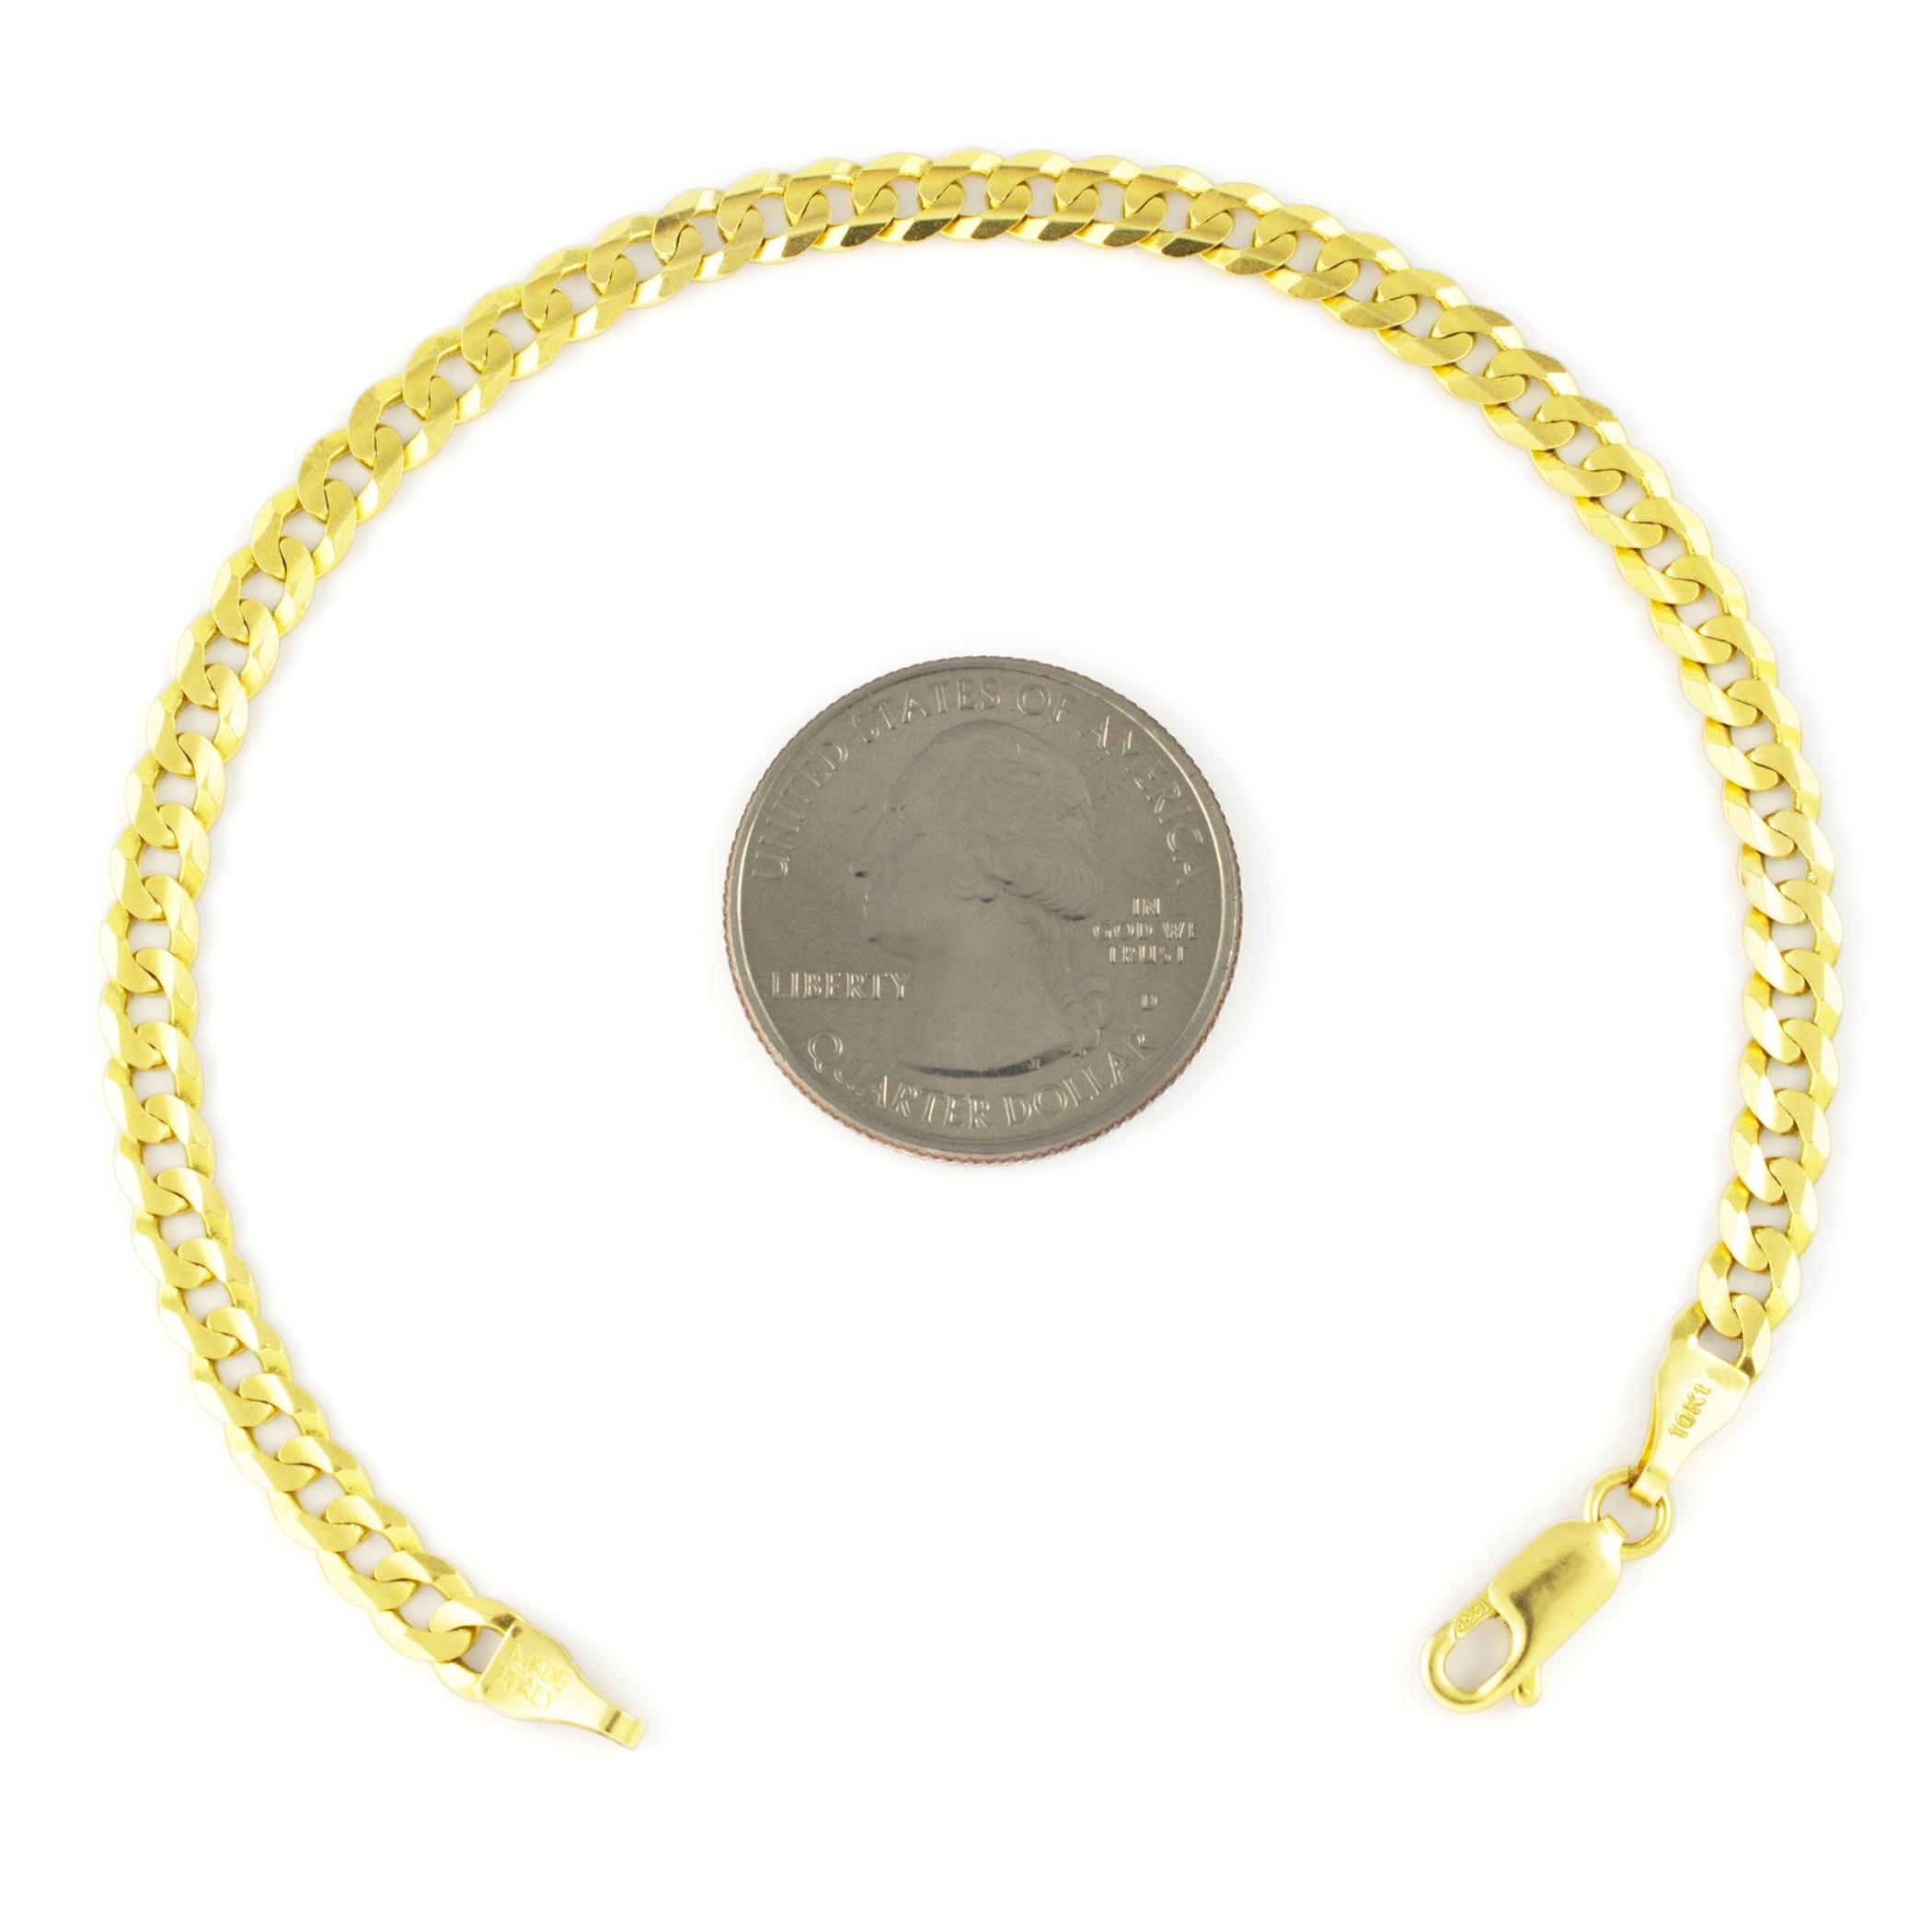 10K-Yellow-Gold-5-5mm-Cuban-Curb-Chain-Bracelet-Lobster-Clasp-Men-Women-7-034-8-034-9-034 thumbnail 15